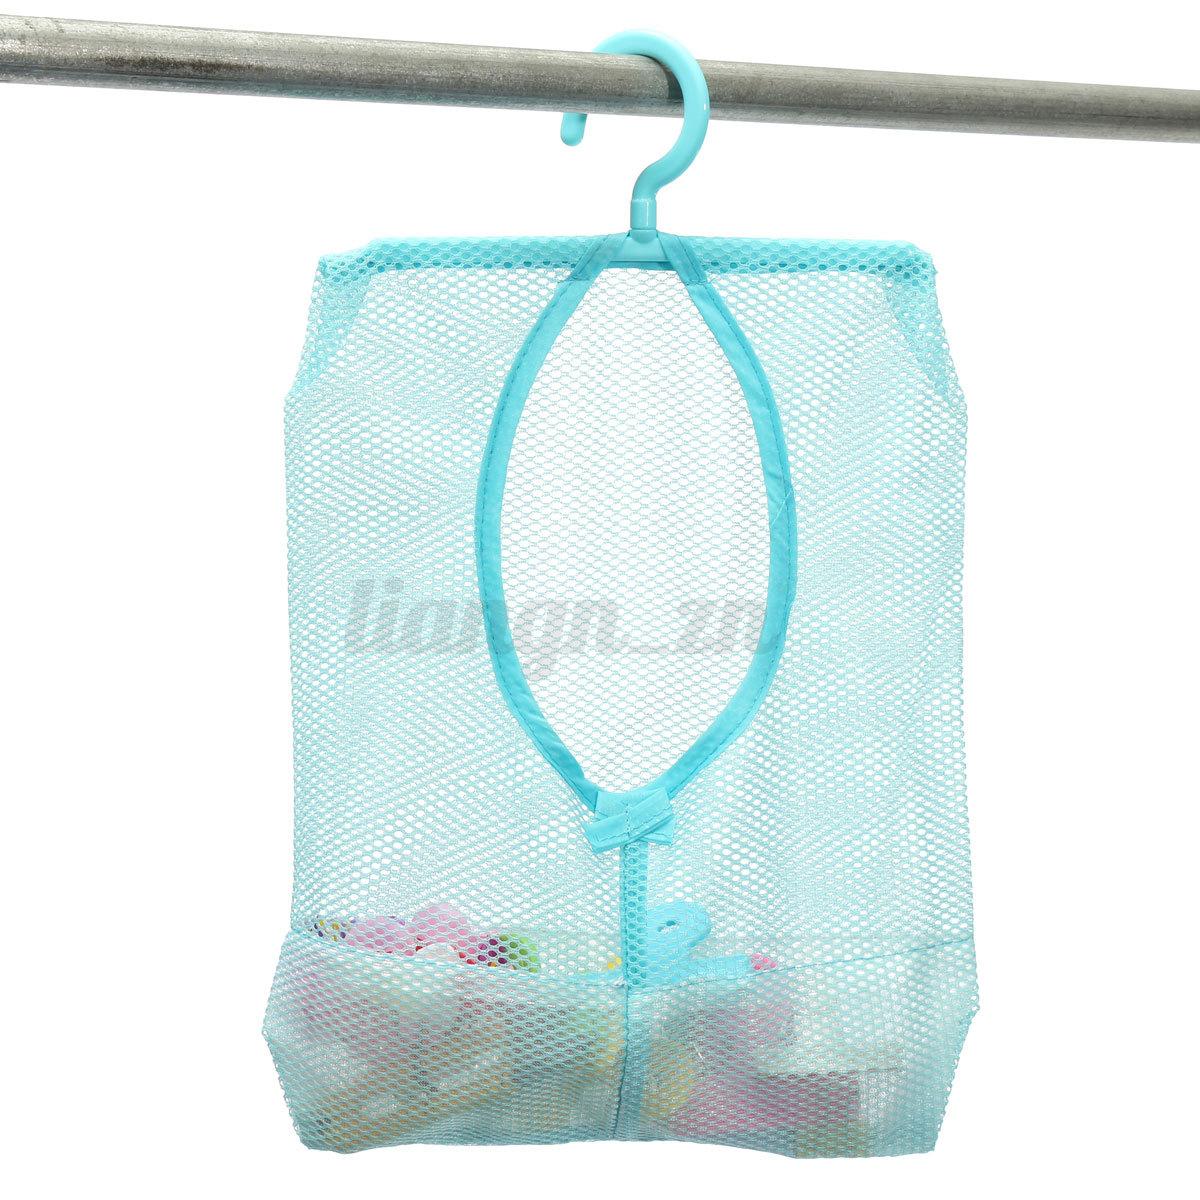 Housse sac filet rangement stockage suspendu v tement salle de bain organisateur ebay for Organisateur salle de bain